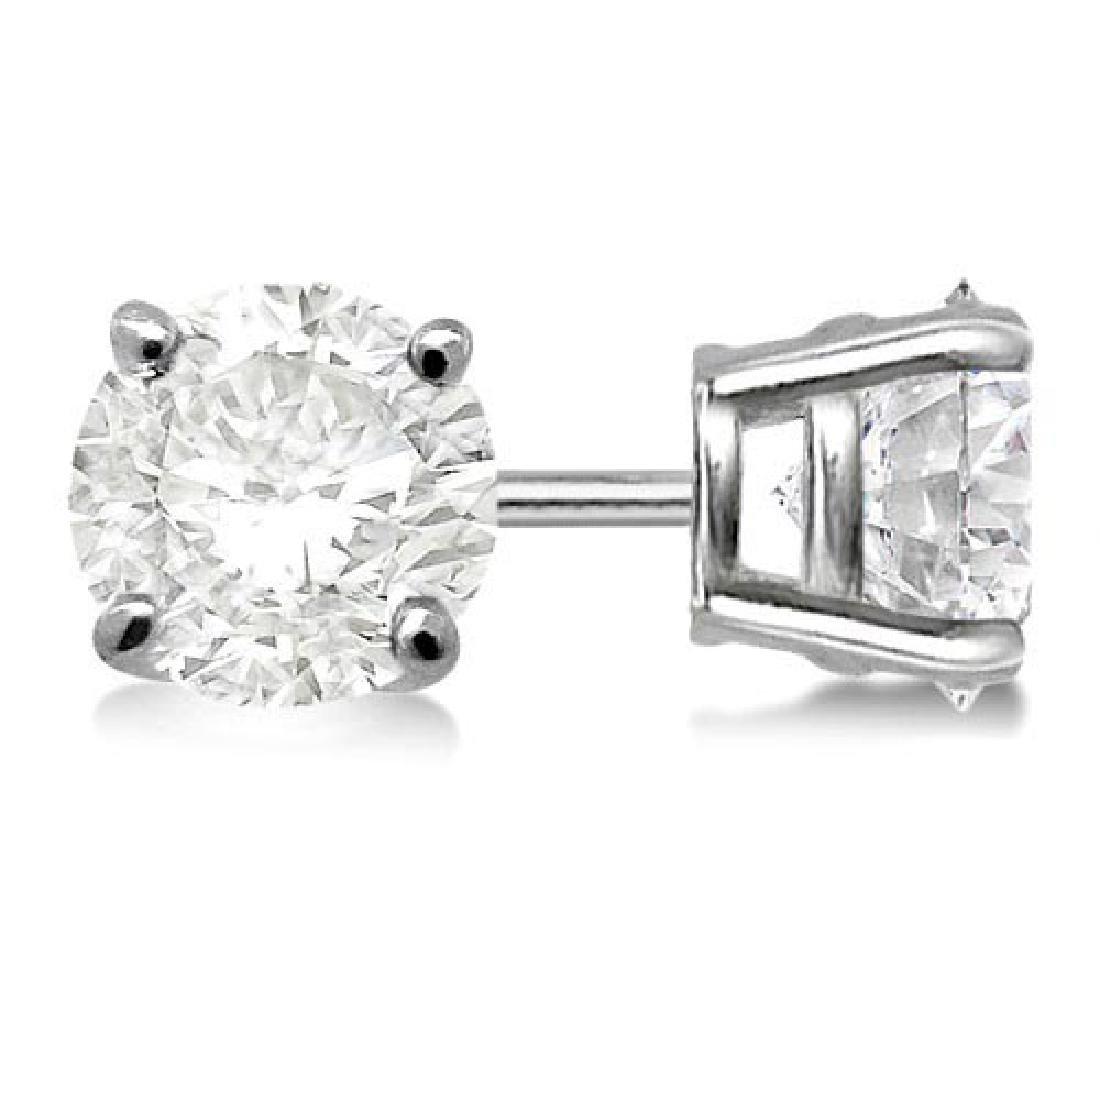 Certified 1.03 CTW Round Diamond Stud Earrings G/SI2